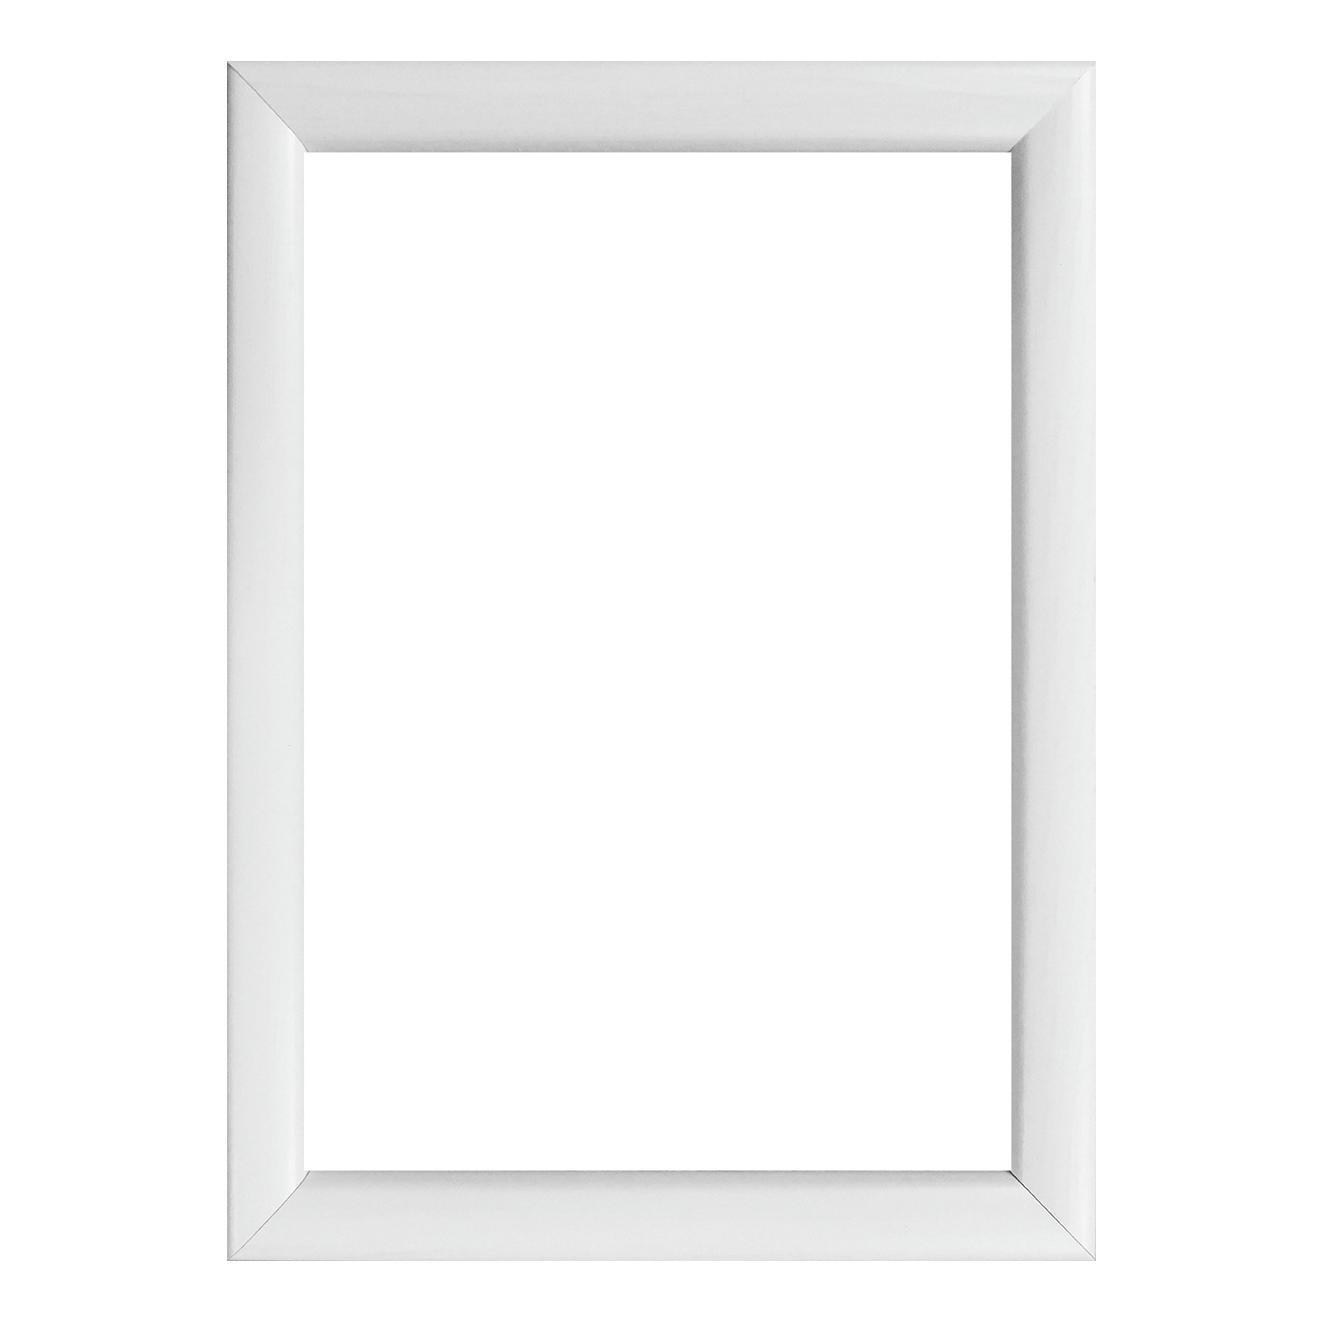 Cornice INSPIRE Pulp bianco per foto da 70x100 cm - 3